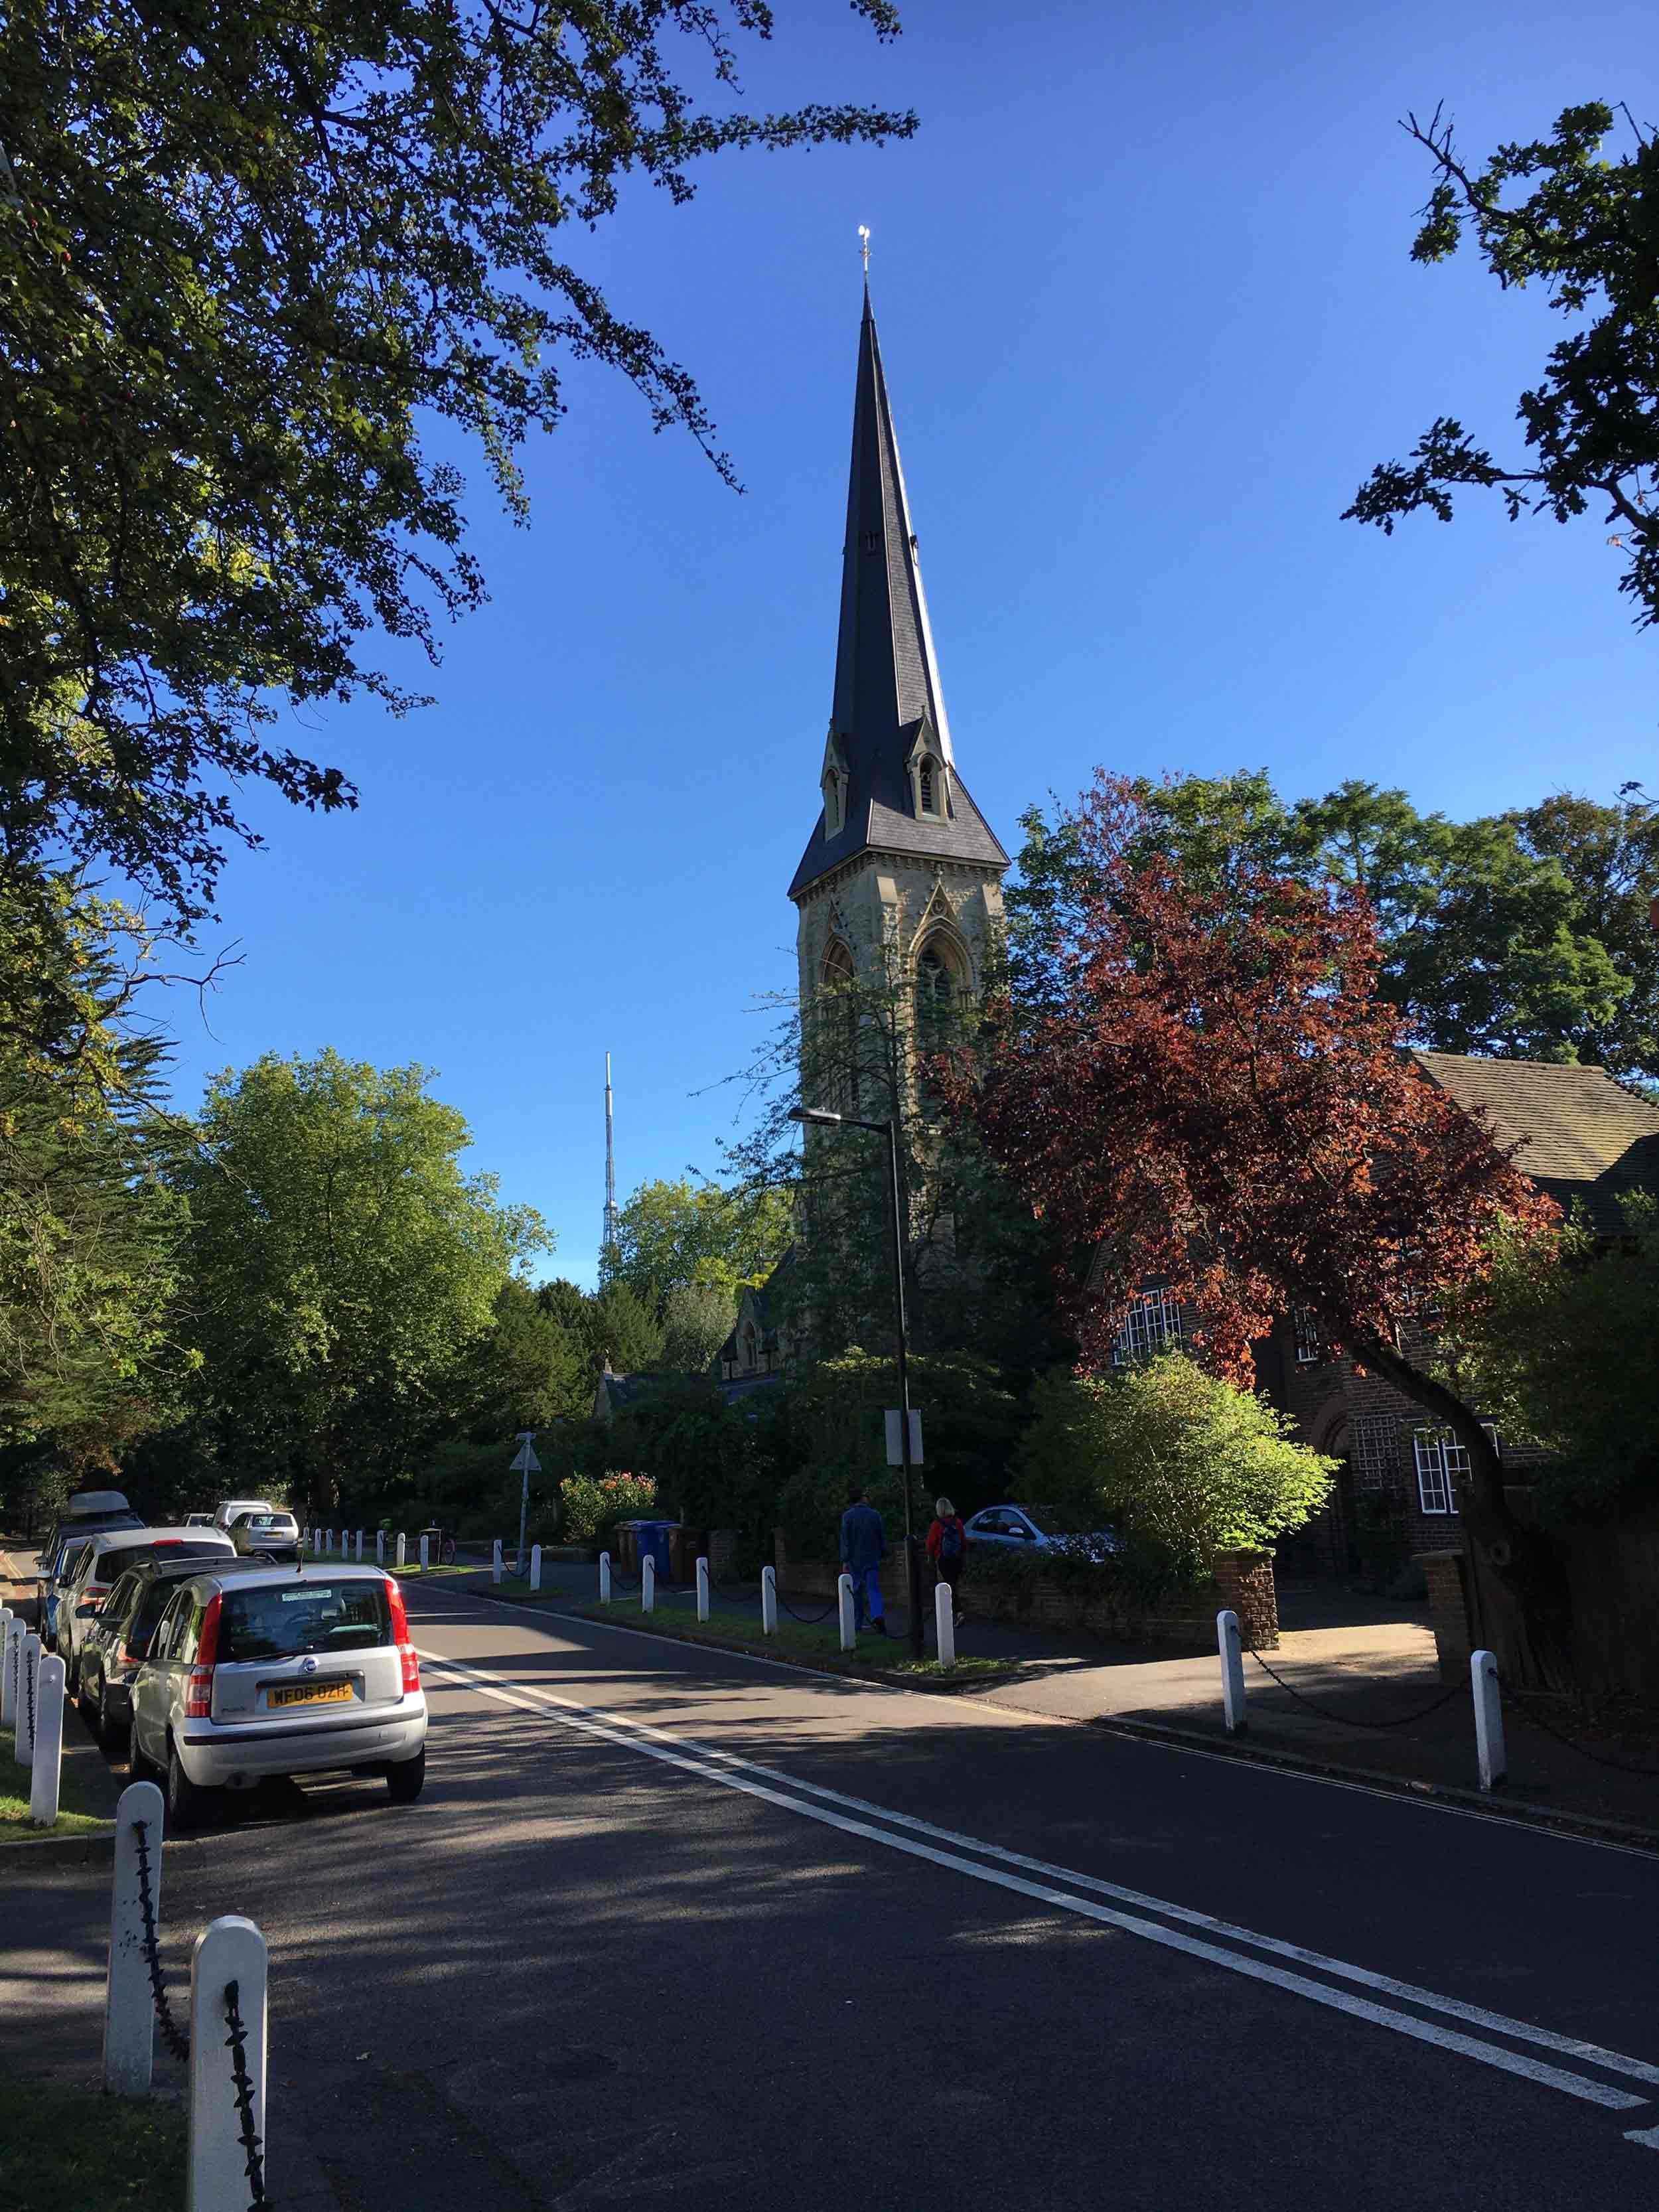 church-street-blog-post-gojauntly